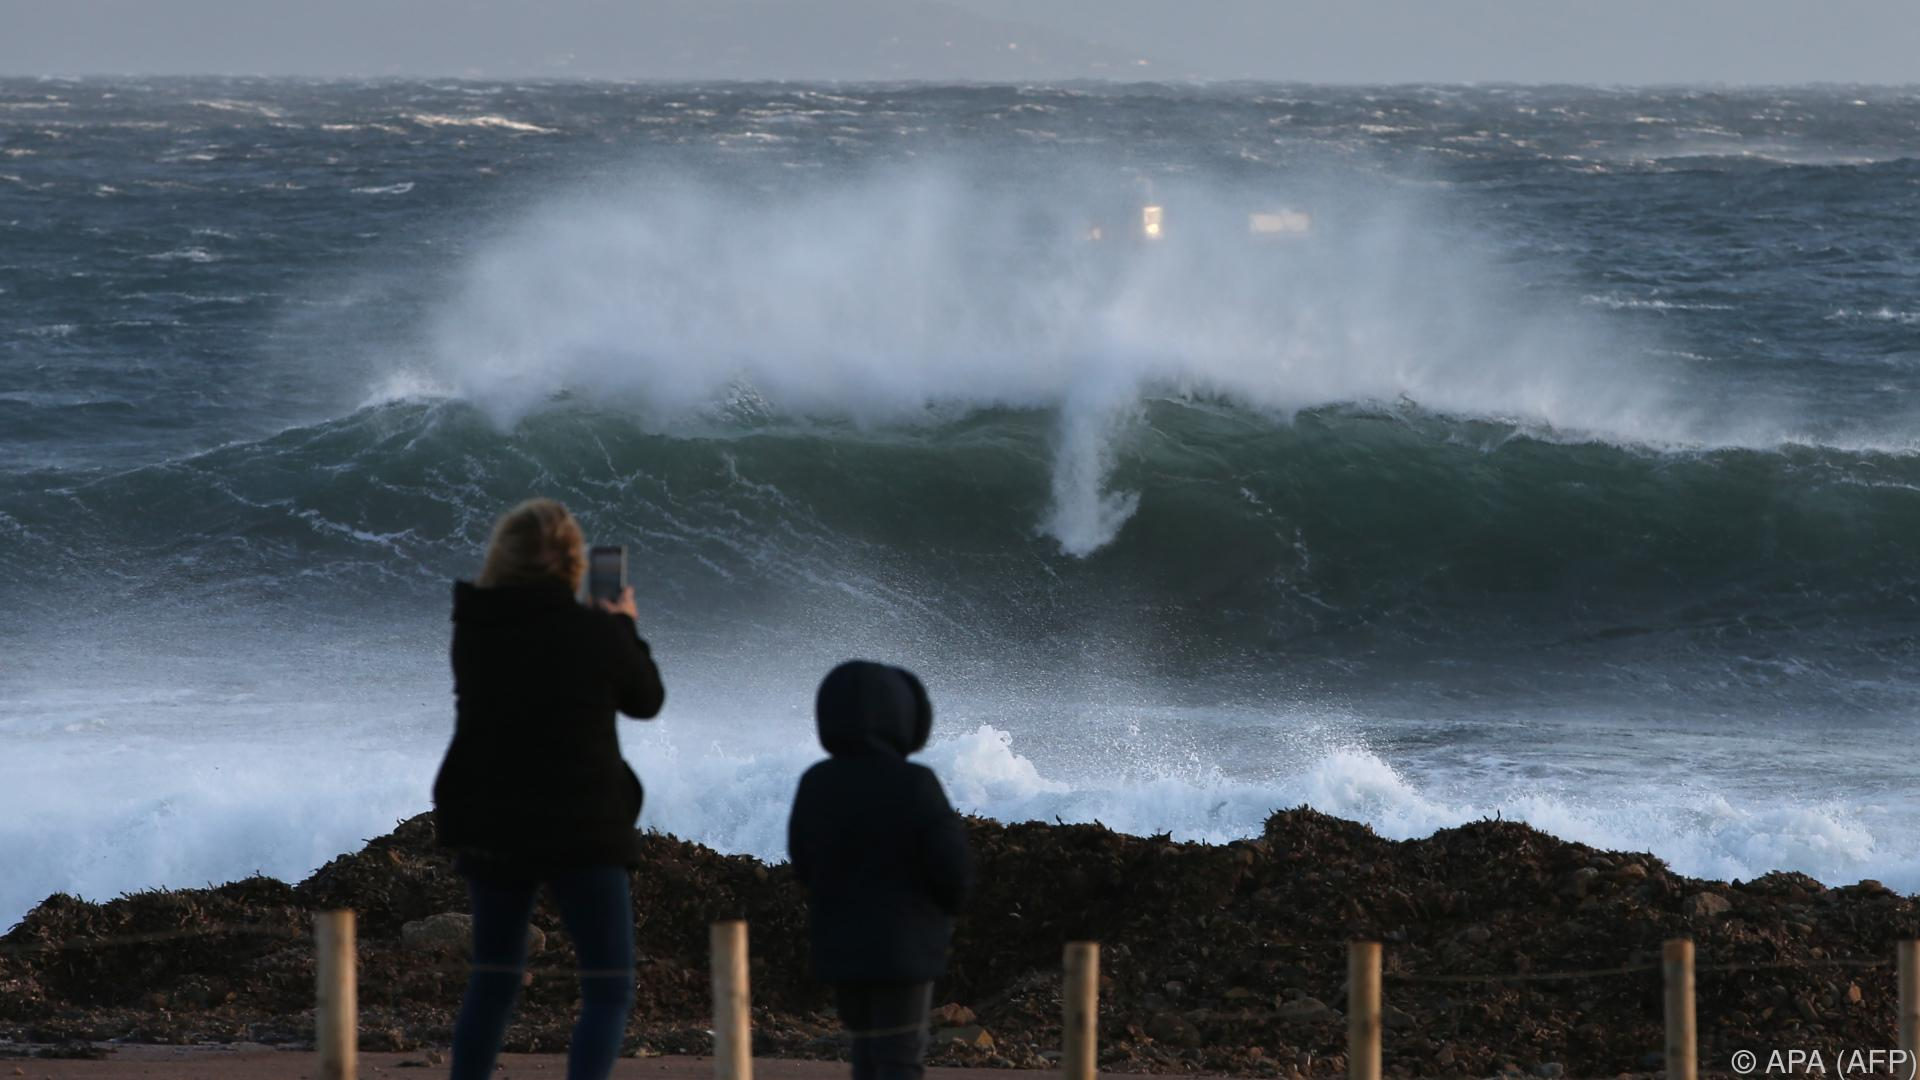 Heftige Sturmböen in Frankreichs Südwesten